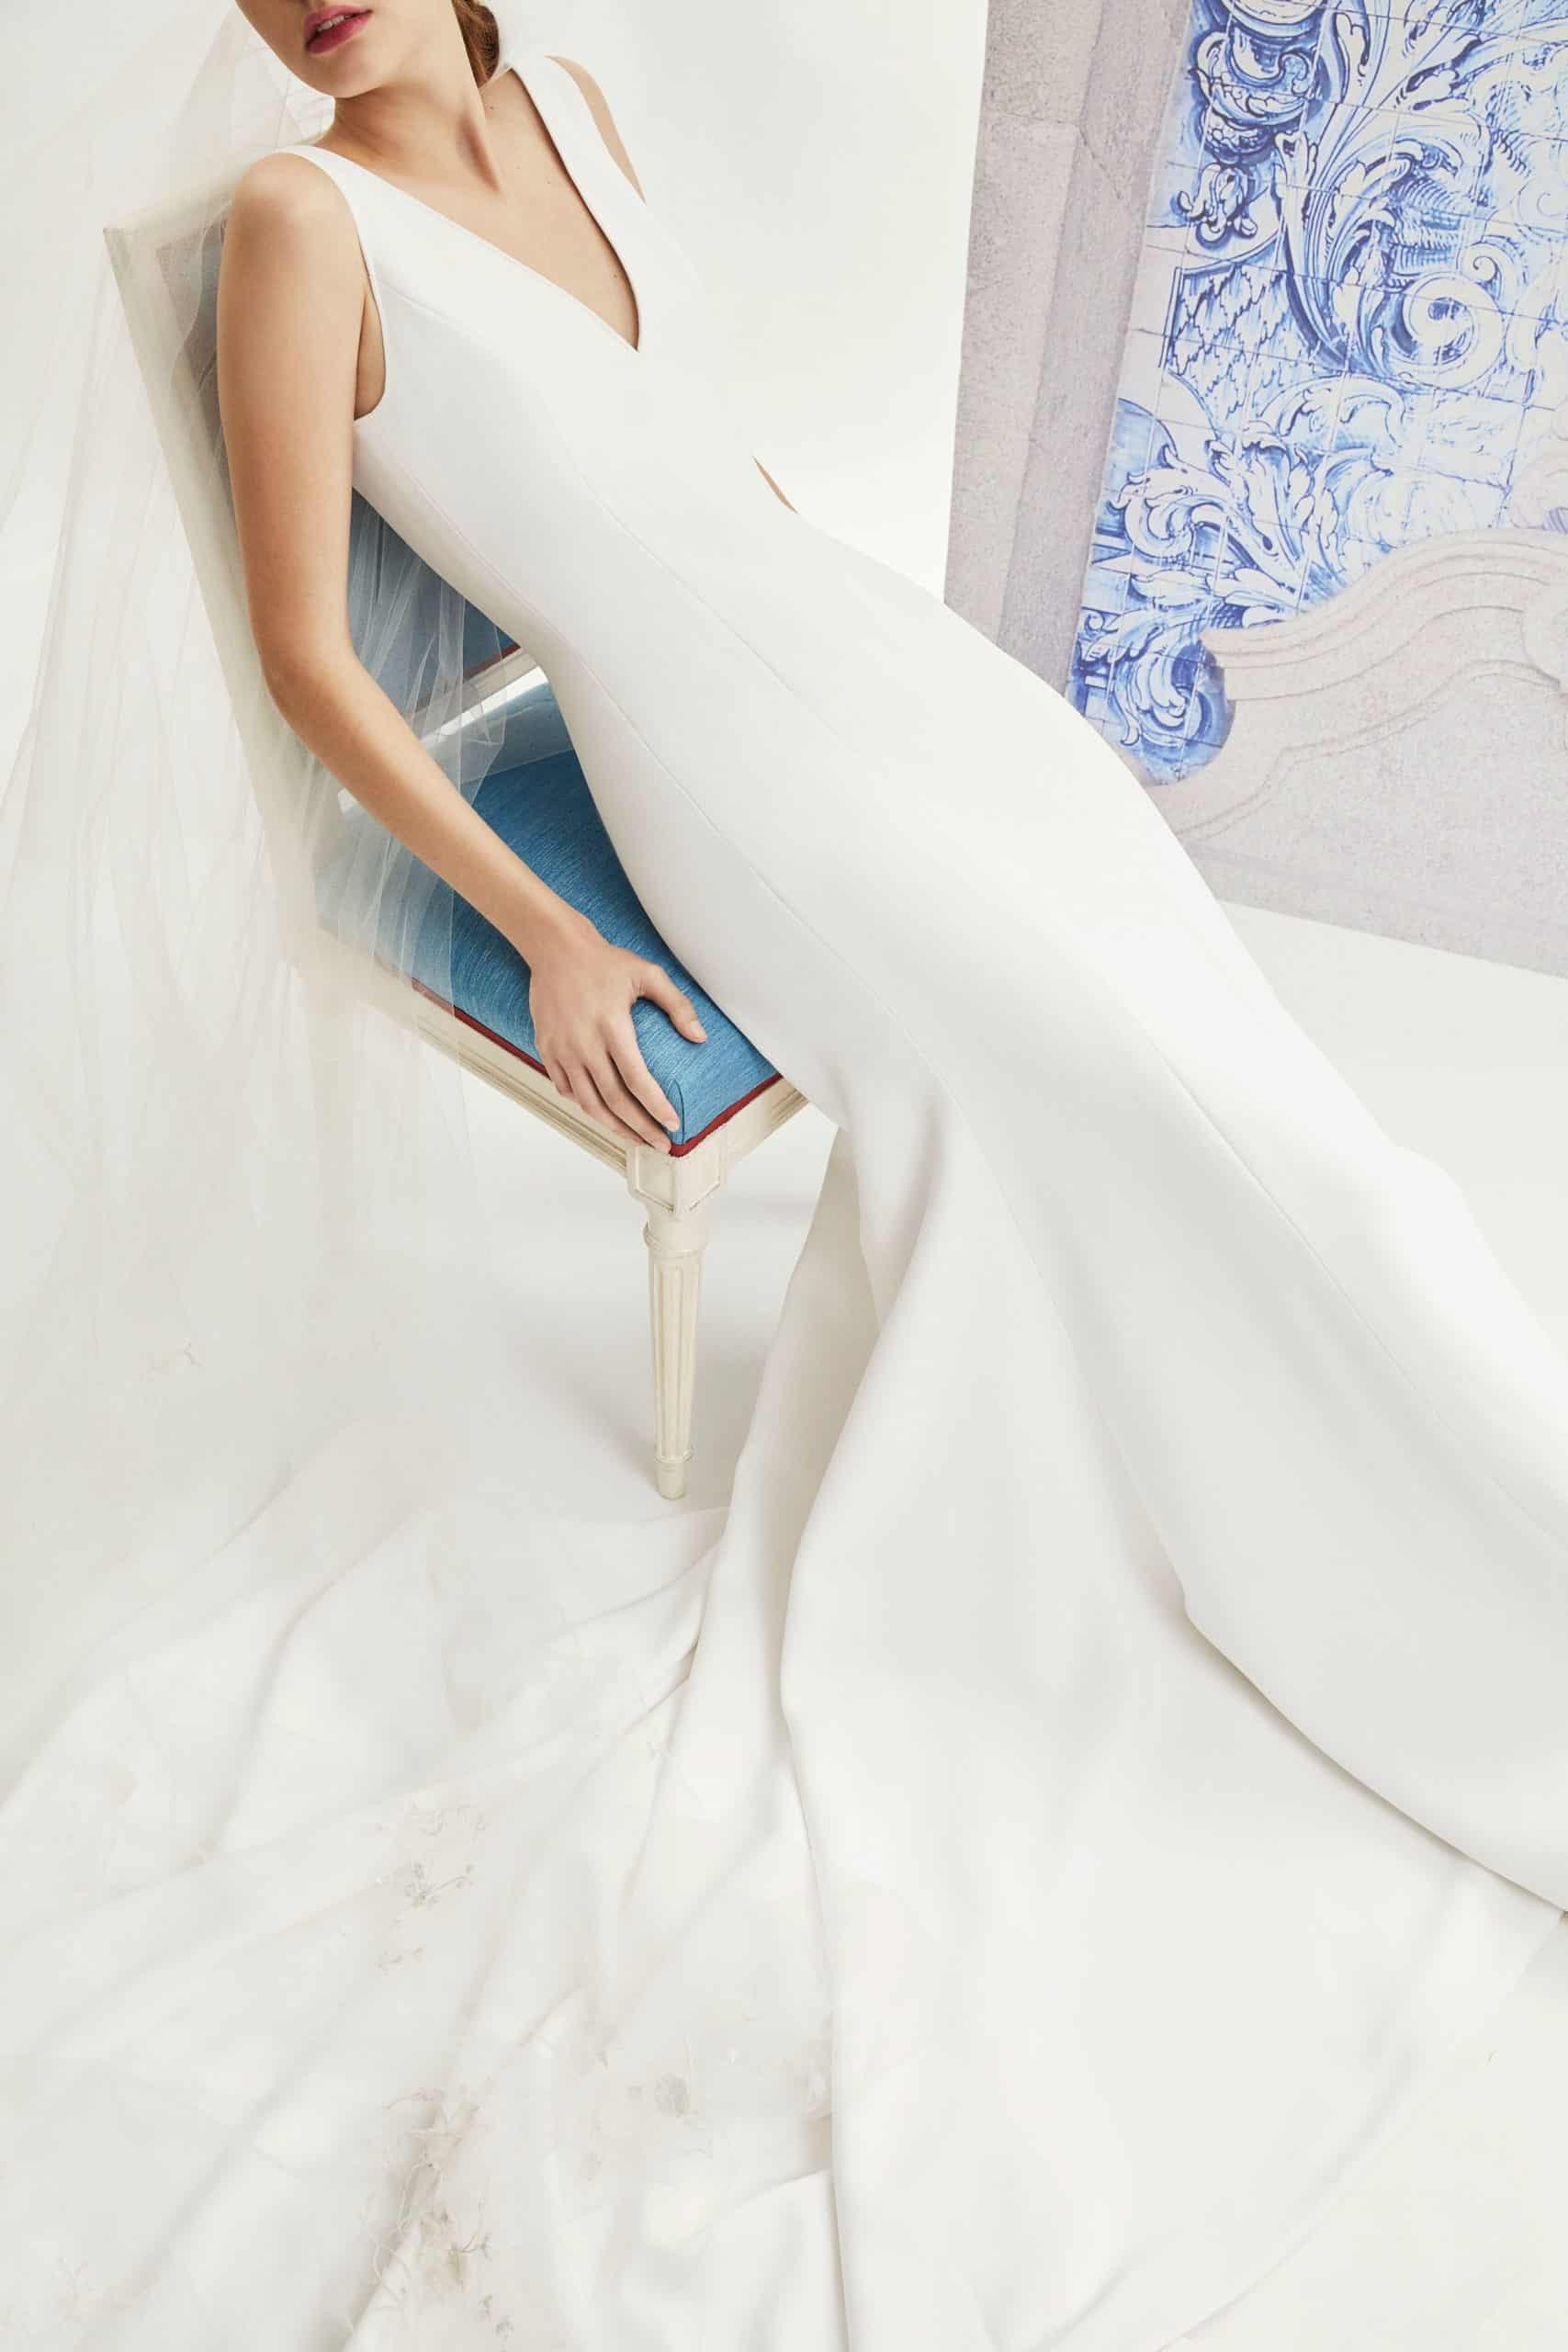 wedding dress like Meghan Markle collection fall 2019 by Carolina Herrera